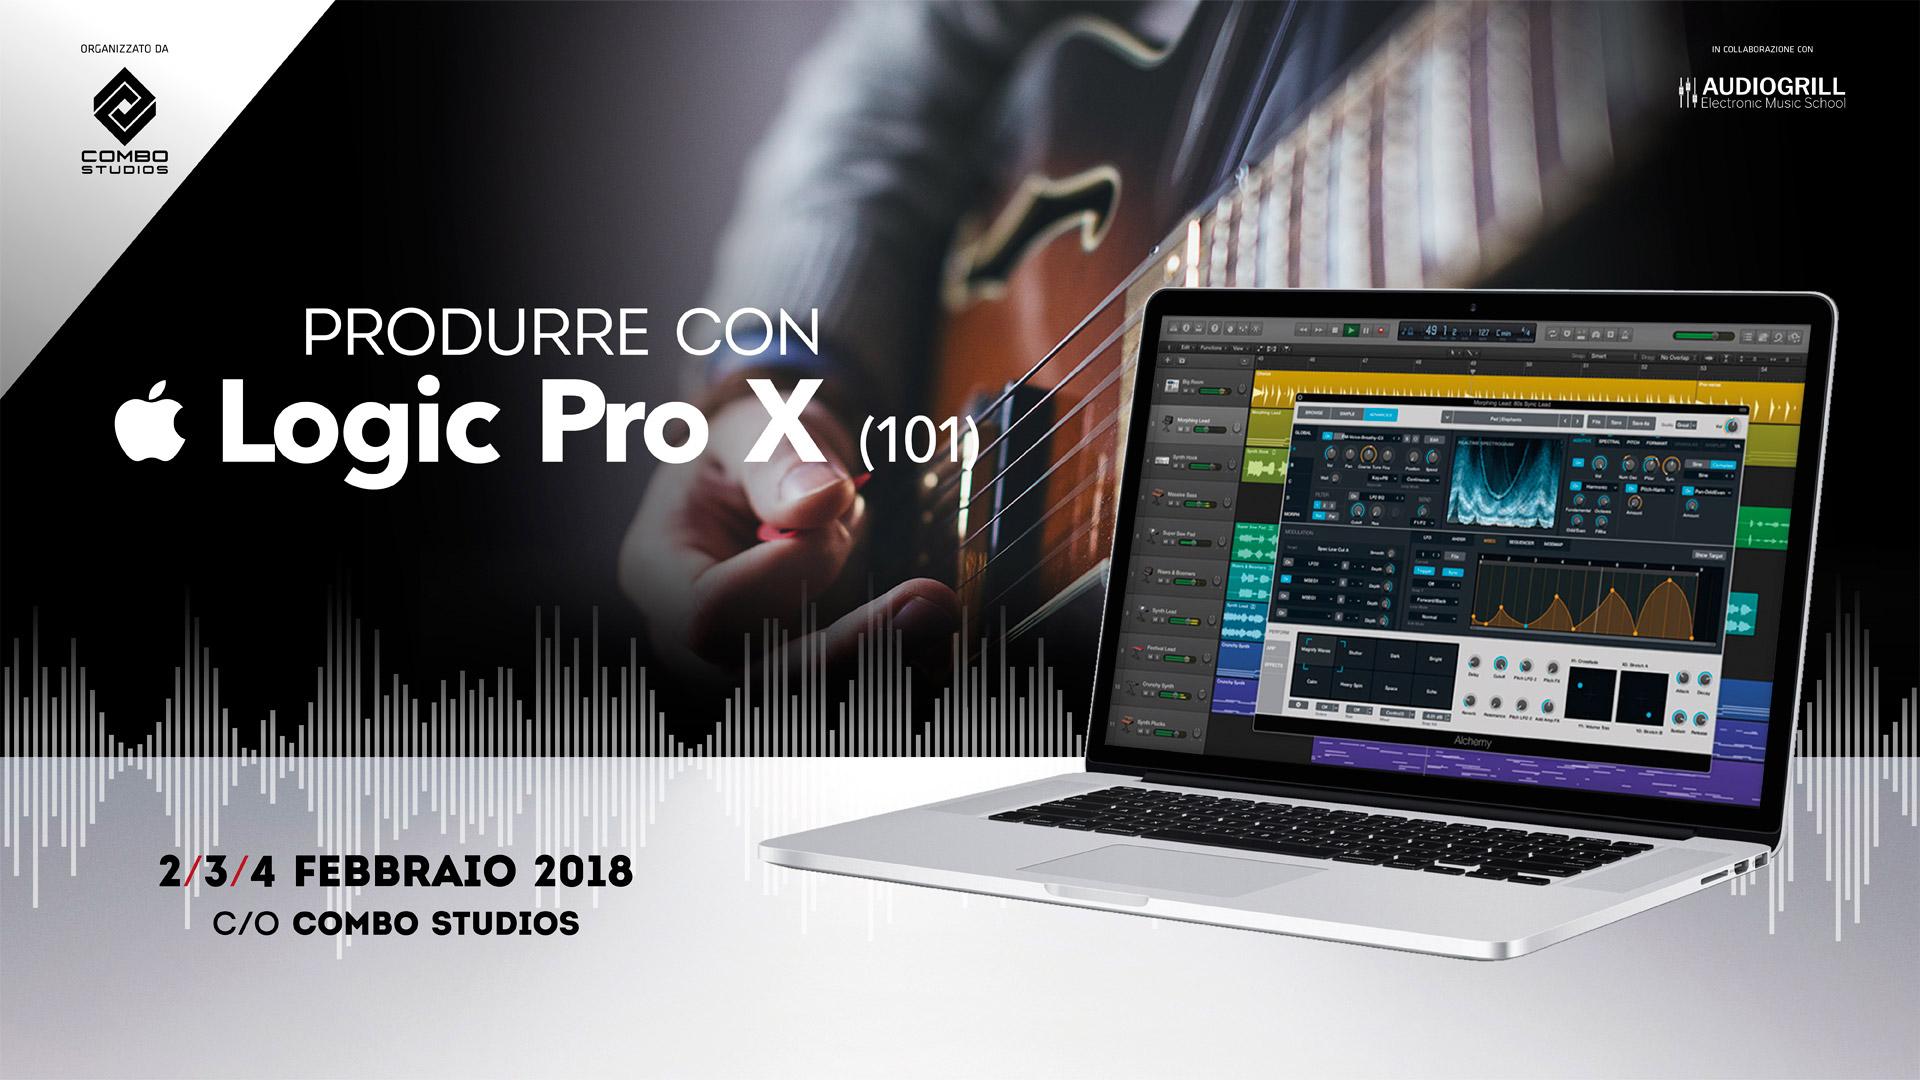 banner-evento-logic-pro-x_febbraio-2018-02-02